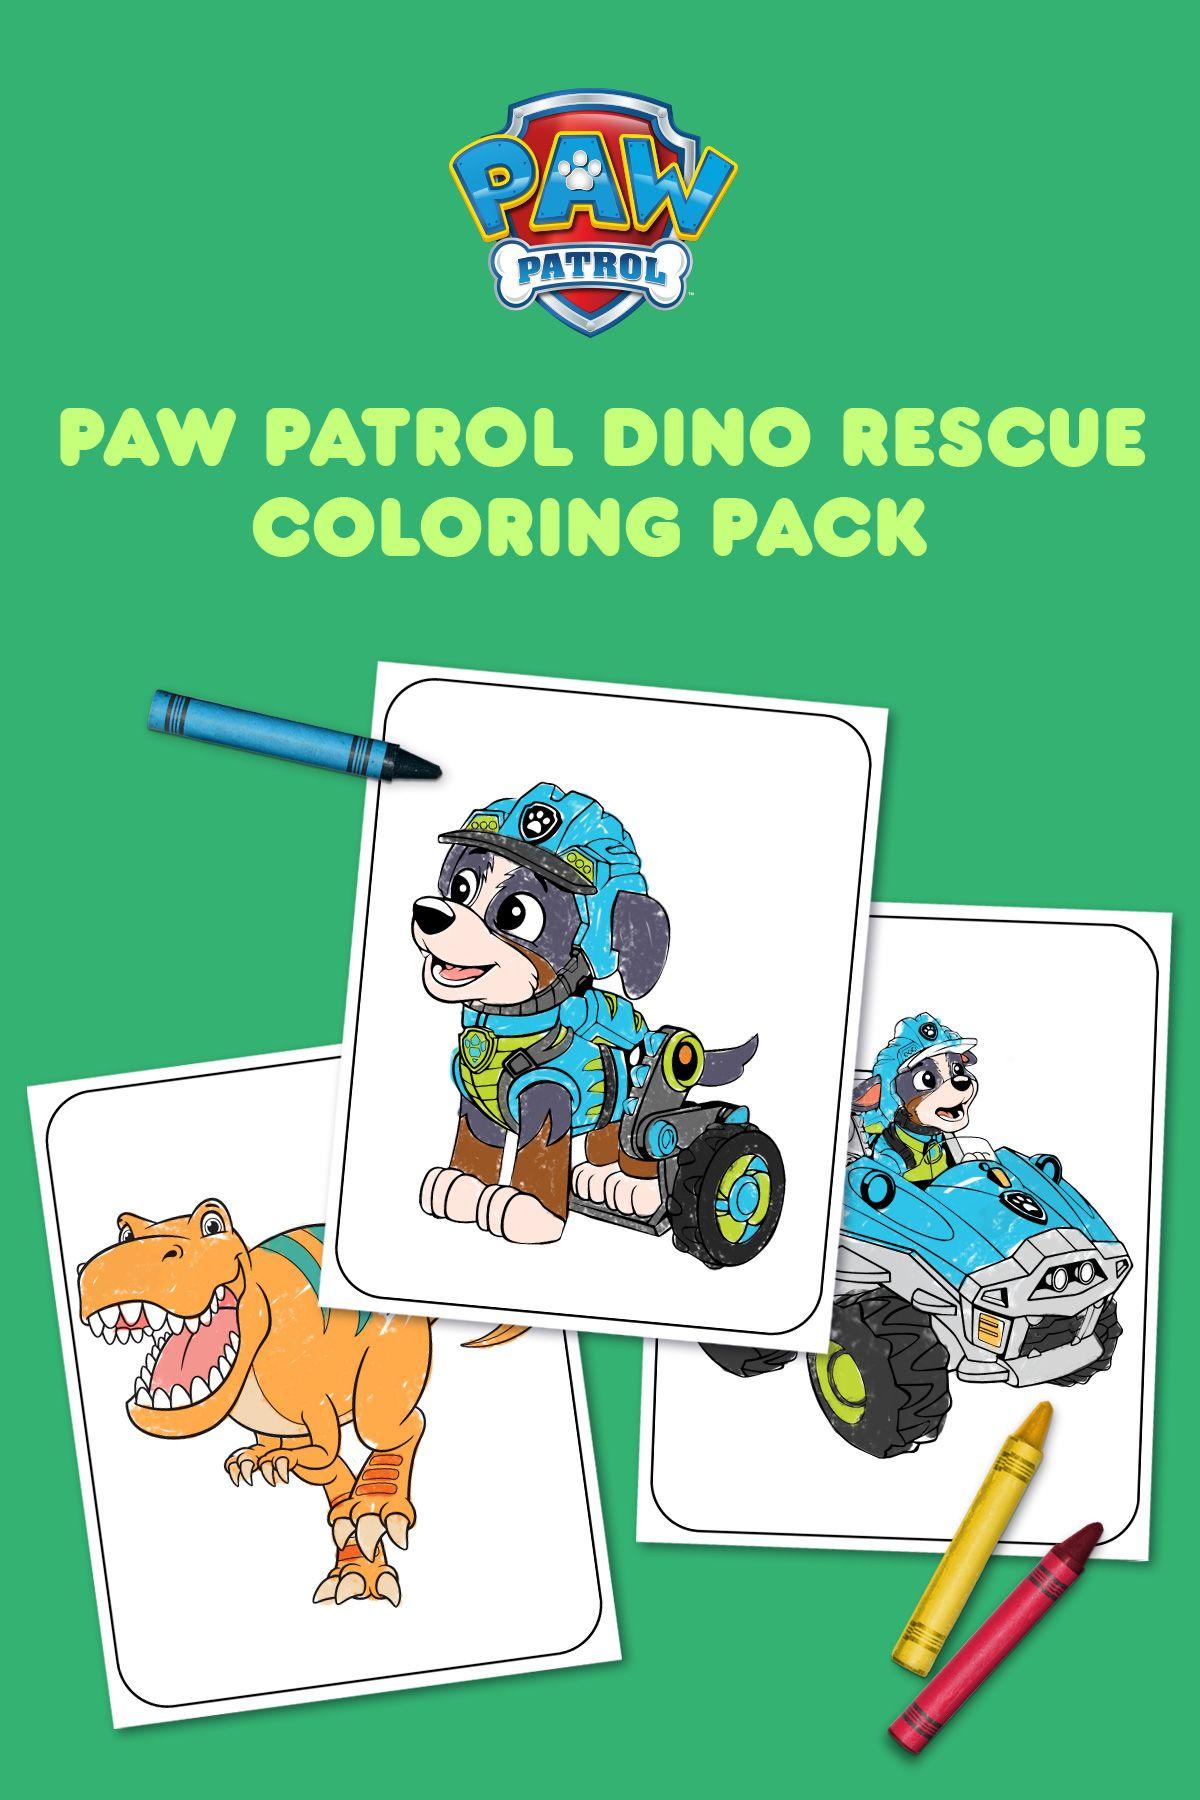 Print This Paw Patrol Dino Rescue Coloring Pack Paw Patrol Coloring Paw Patrol Coloring Pages Paw Patrol [ 1800 x 1200 Pixel ]